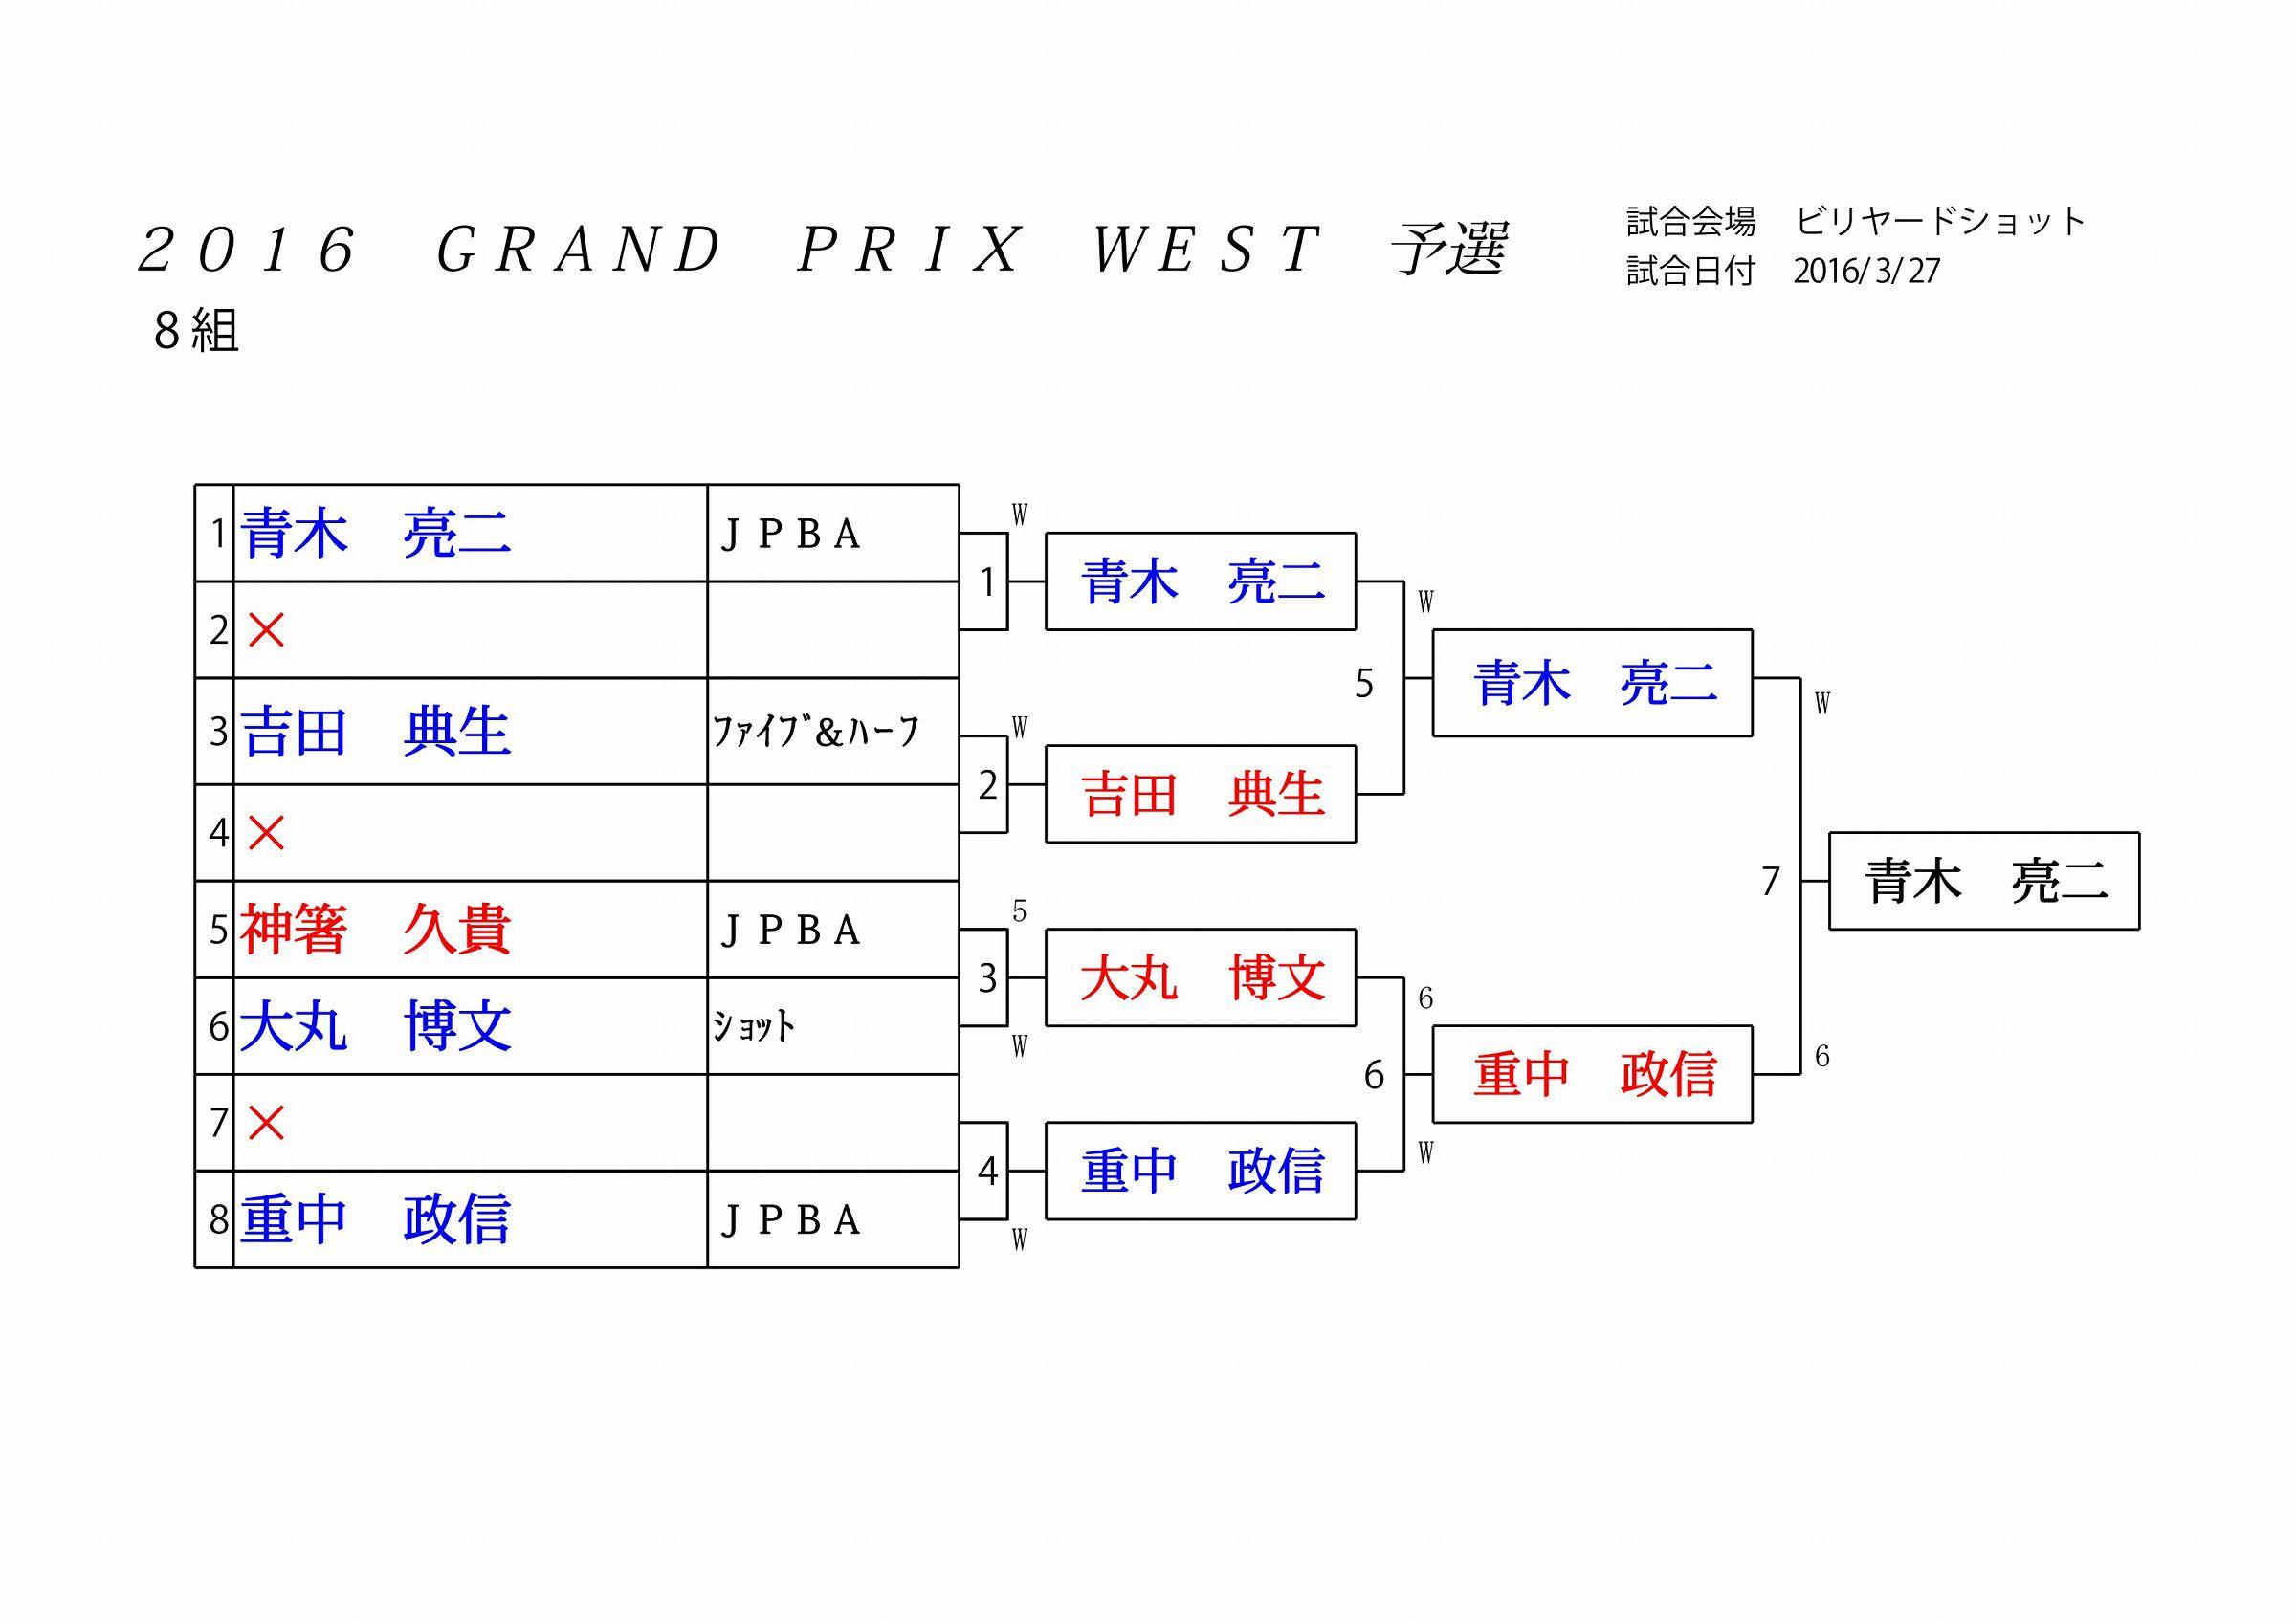 2016 GRAND PRIX WEST 予選_08